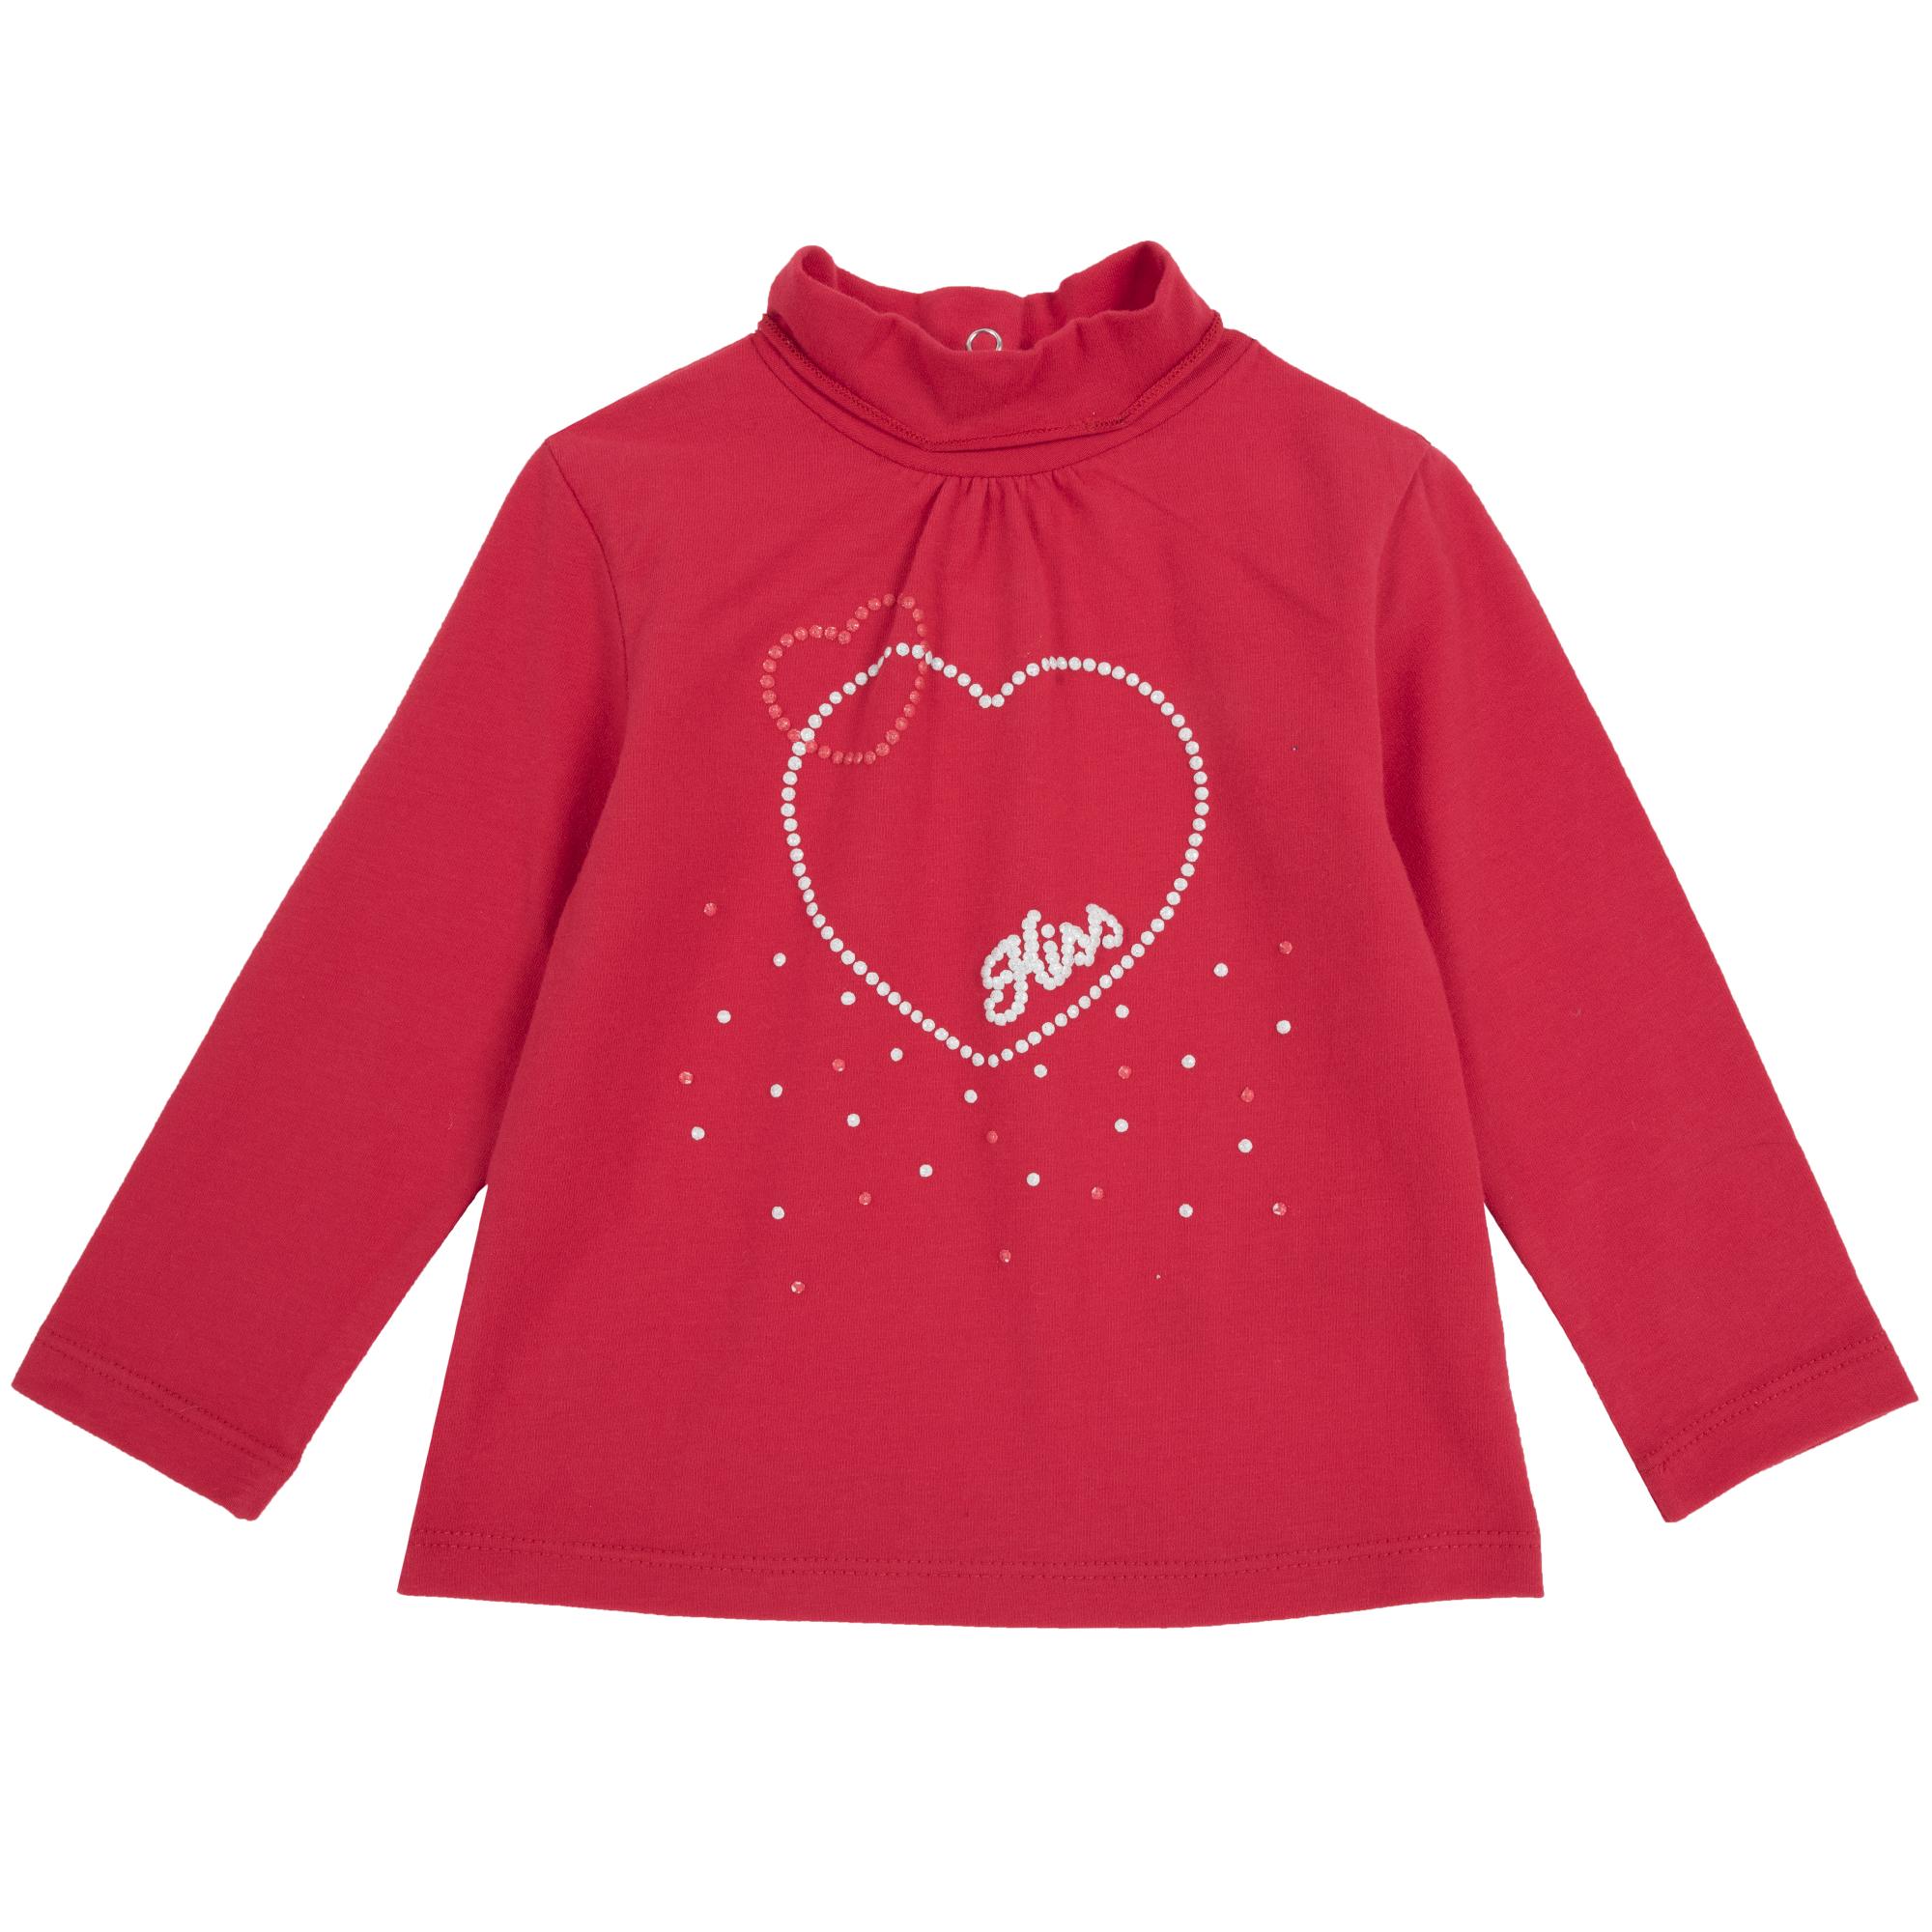 Tricou copii Chicco, rosu, 06486